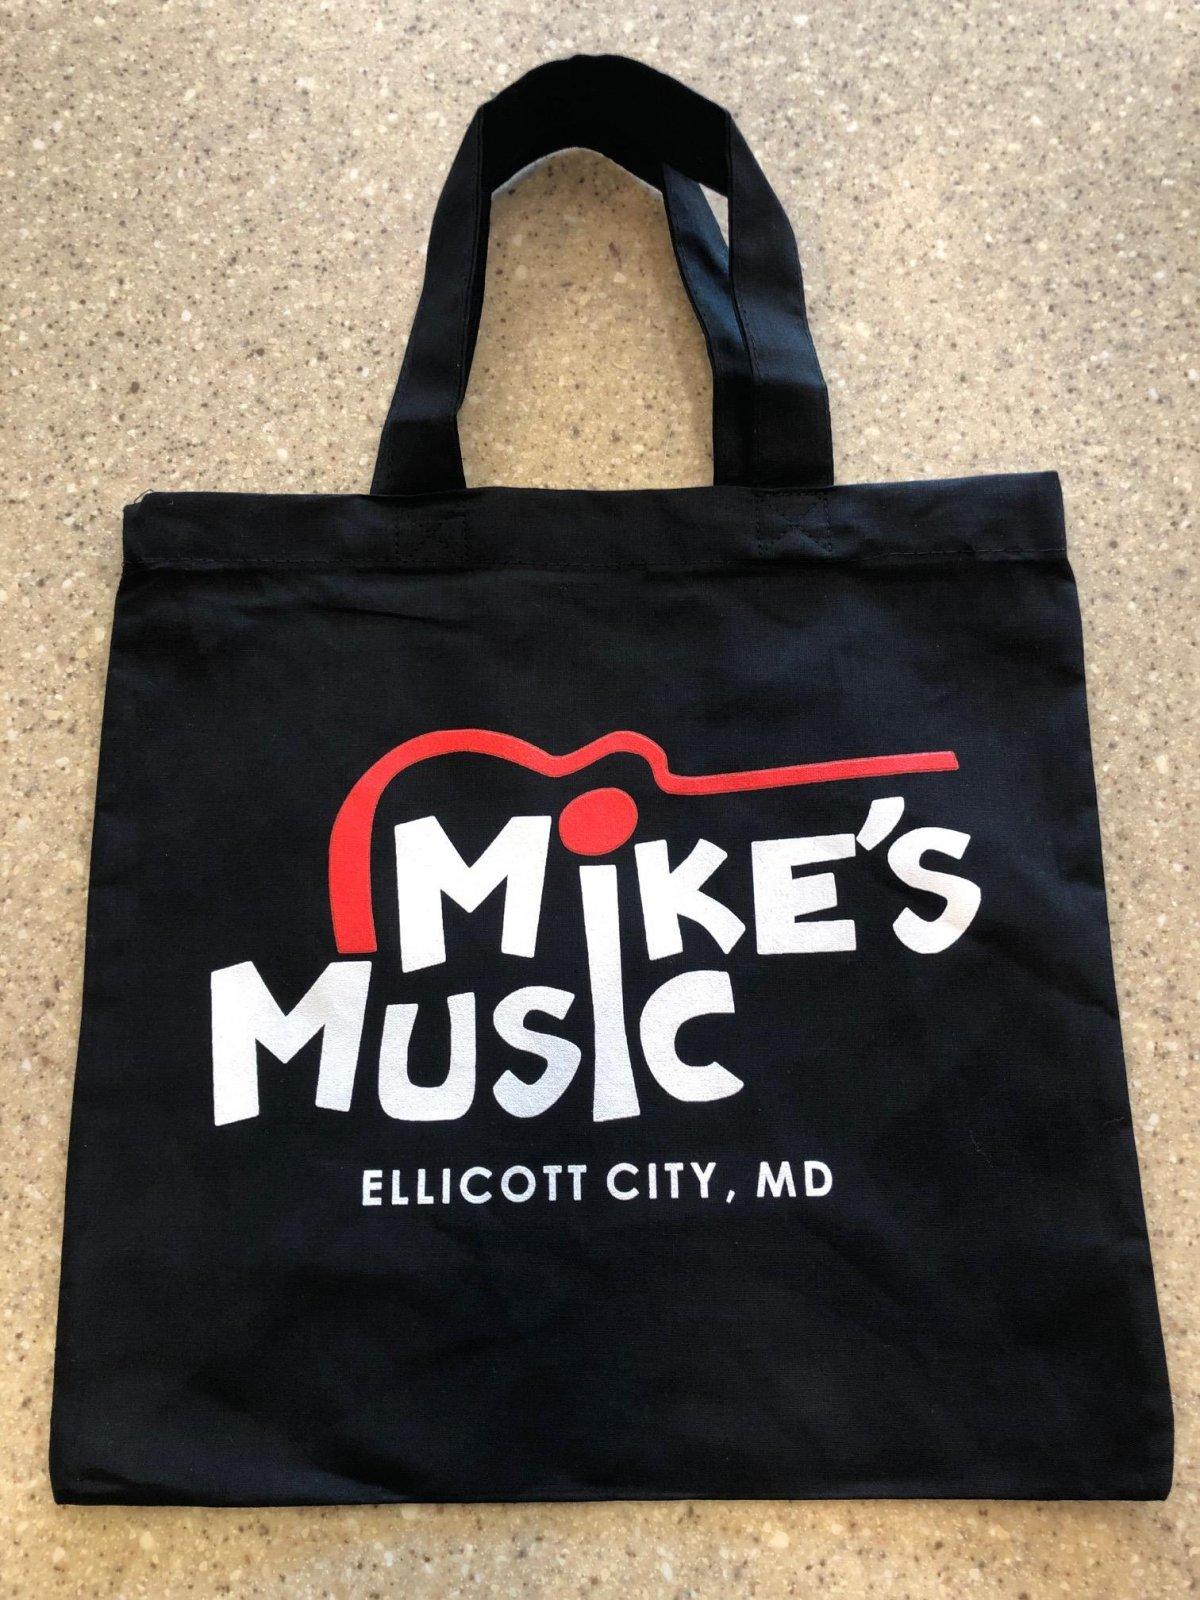 Mike's Music Book Tote Bag